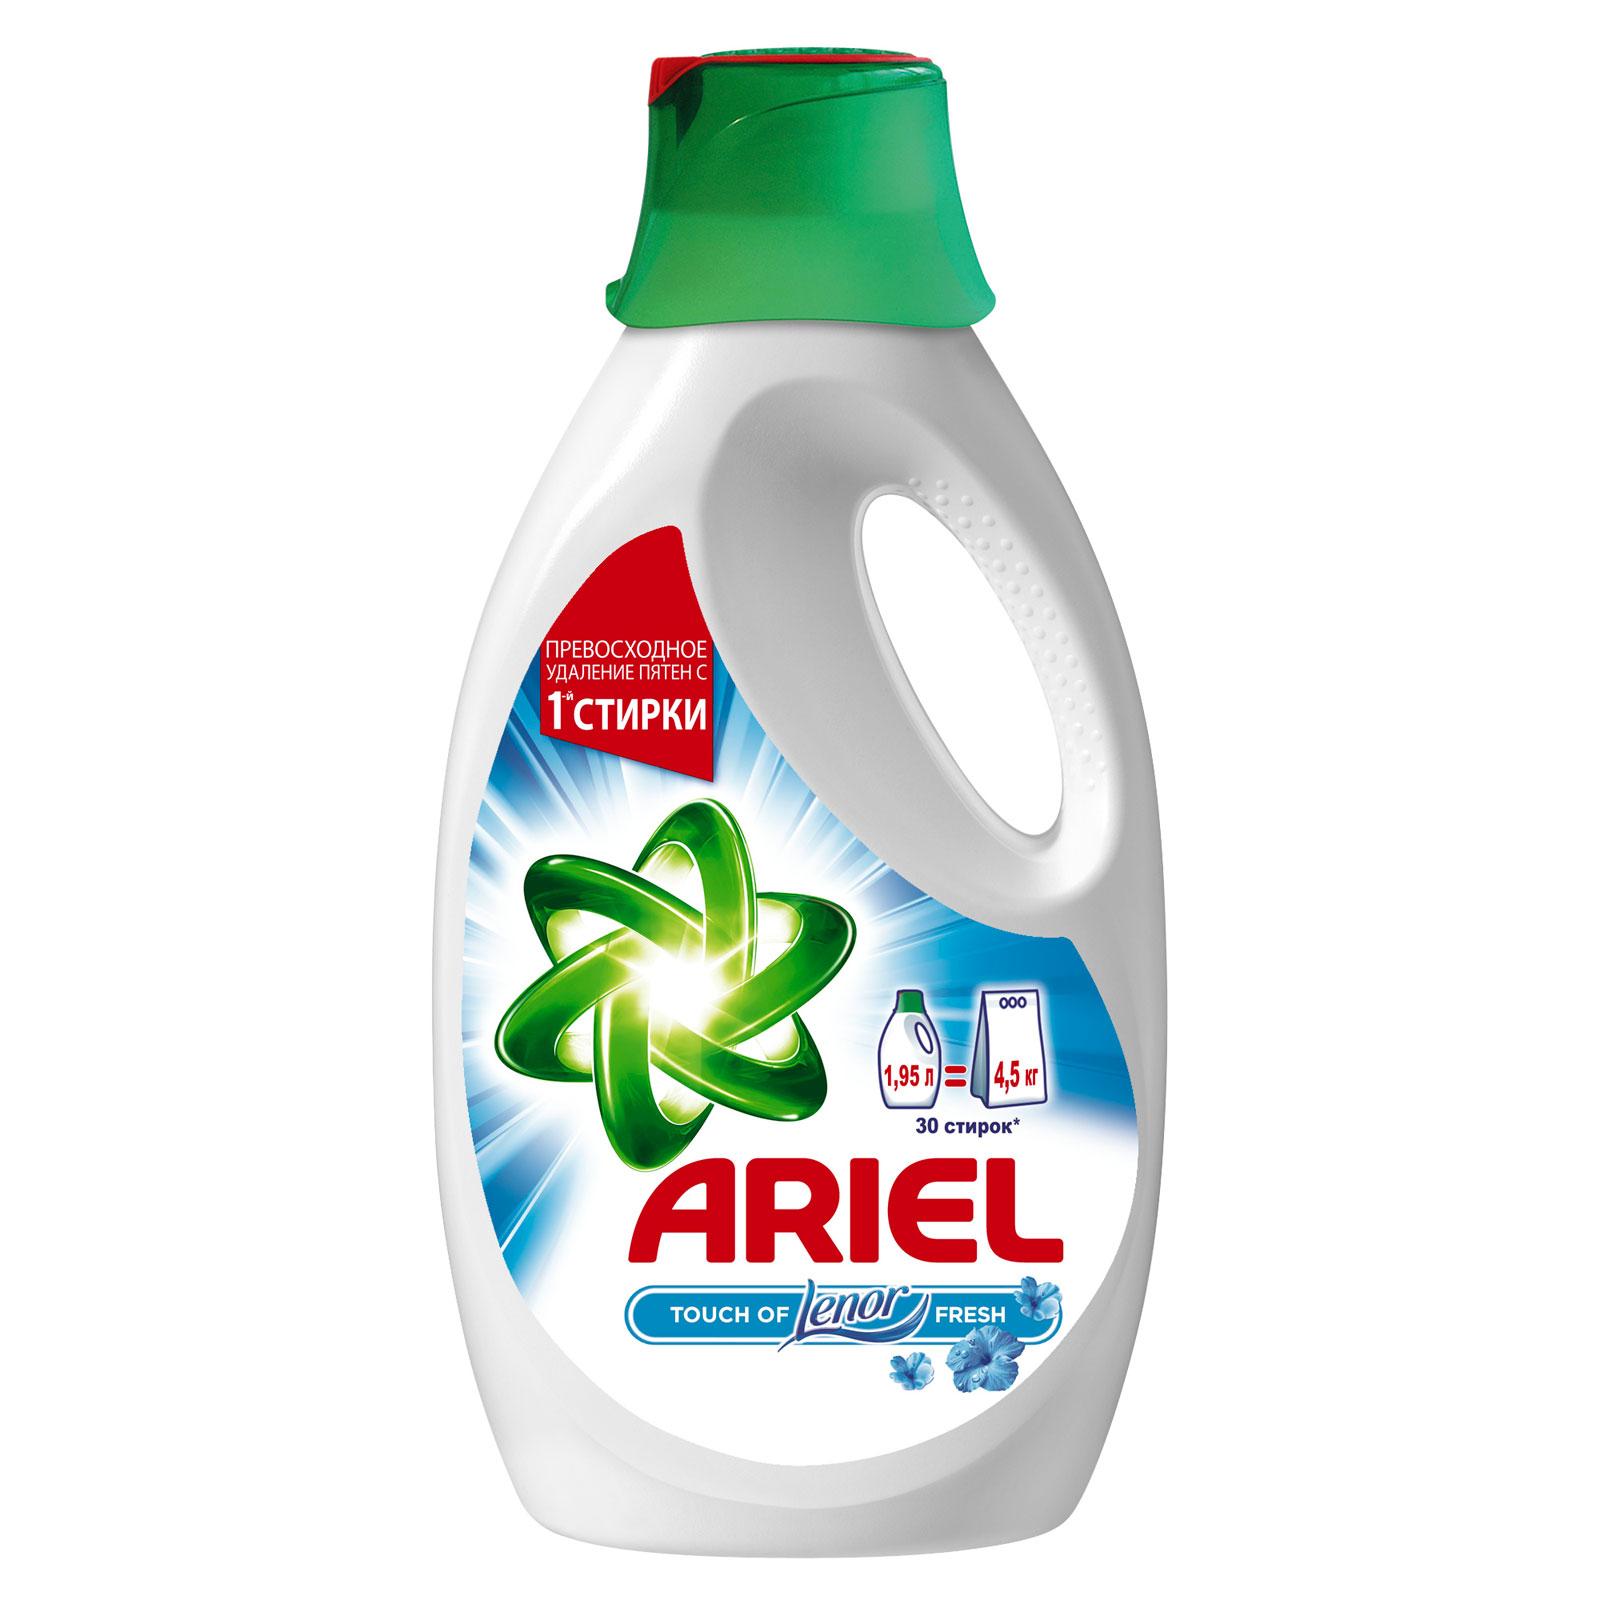 Гель для стирки Ariel Touch of Lenor fresh 1,95л<br>